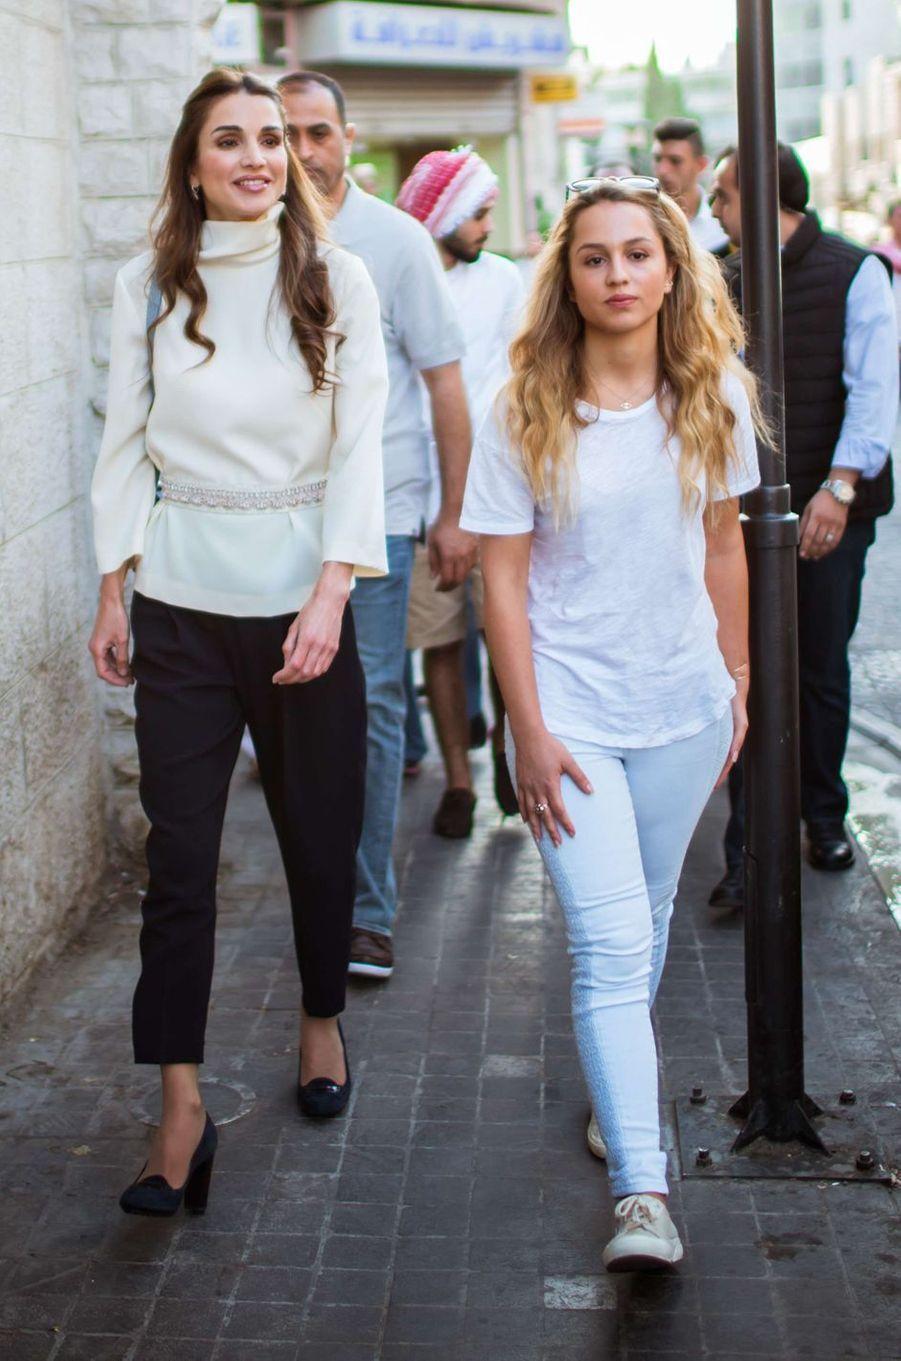 La princesse Iman de Jordanie avec sa mère la reine Rania, le 16 août 2015